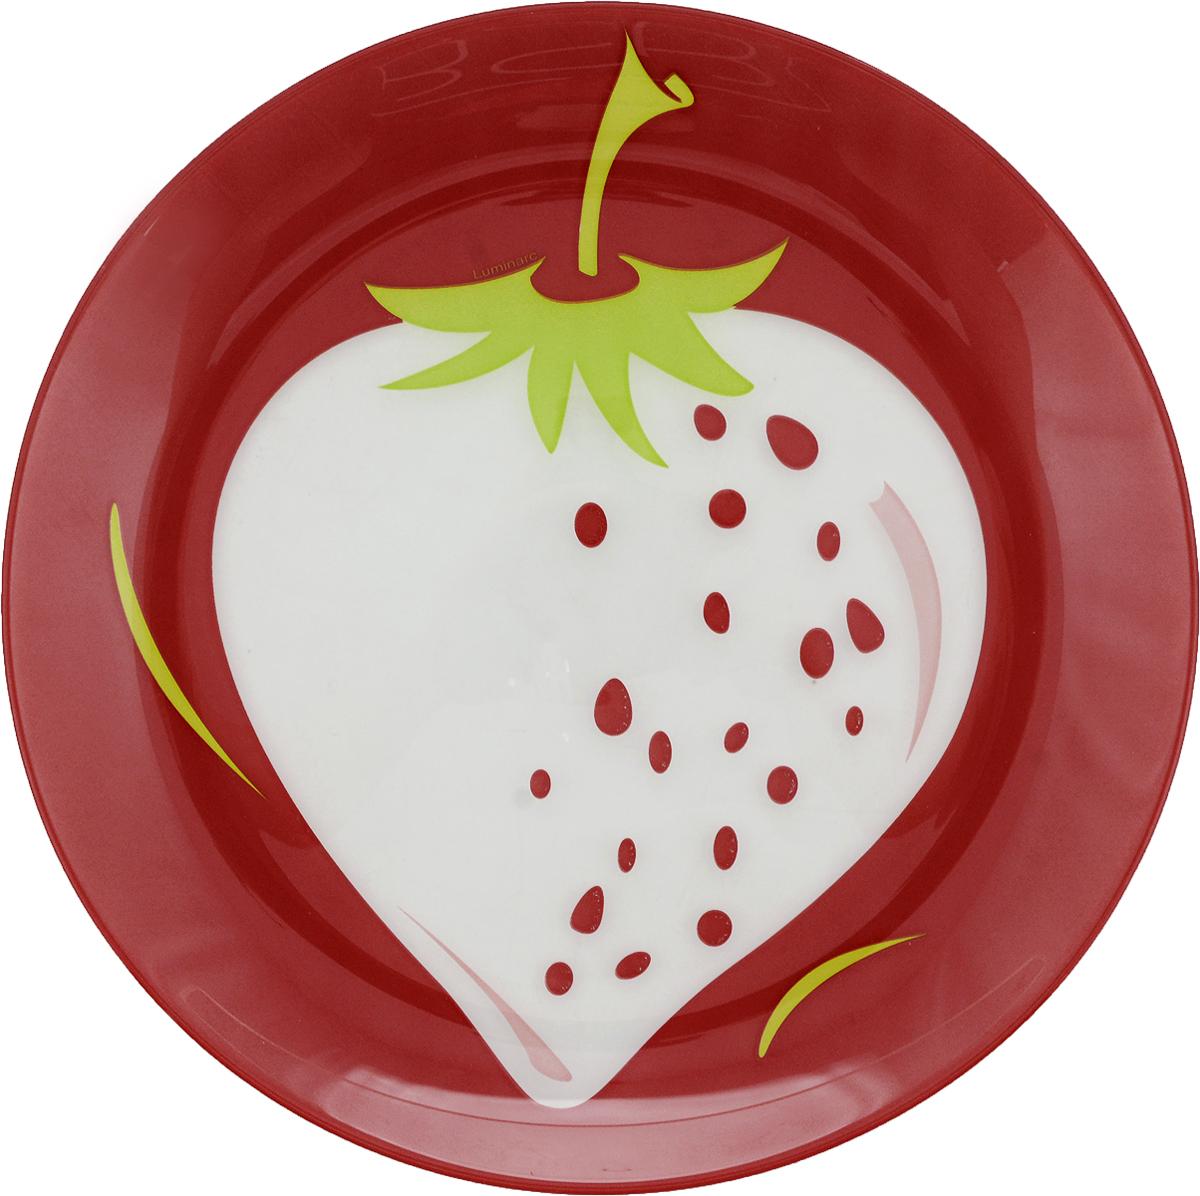 Тарелка десертная Luminarc Клубника, диаметр 20 см тарелка десертная luminarcalizee диаметр 22 см